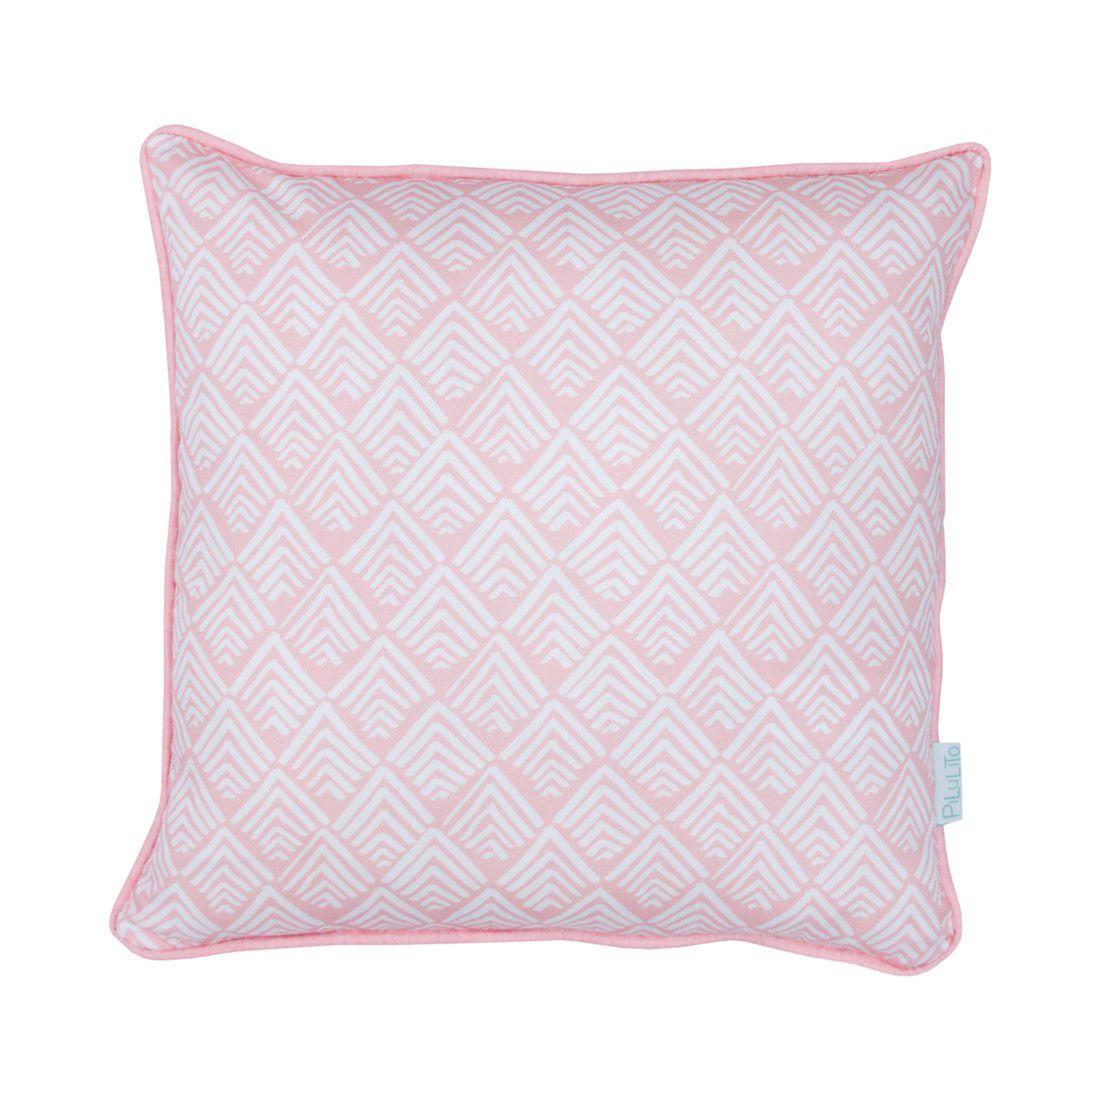 Capa de almofada 40x40cm oca rosa chá